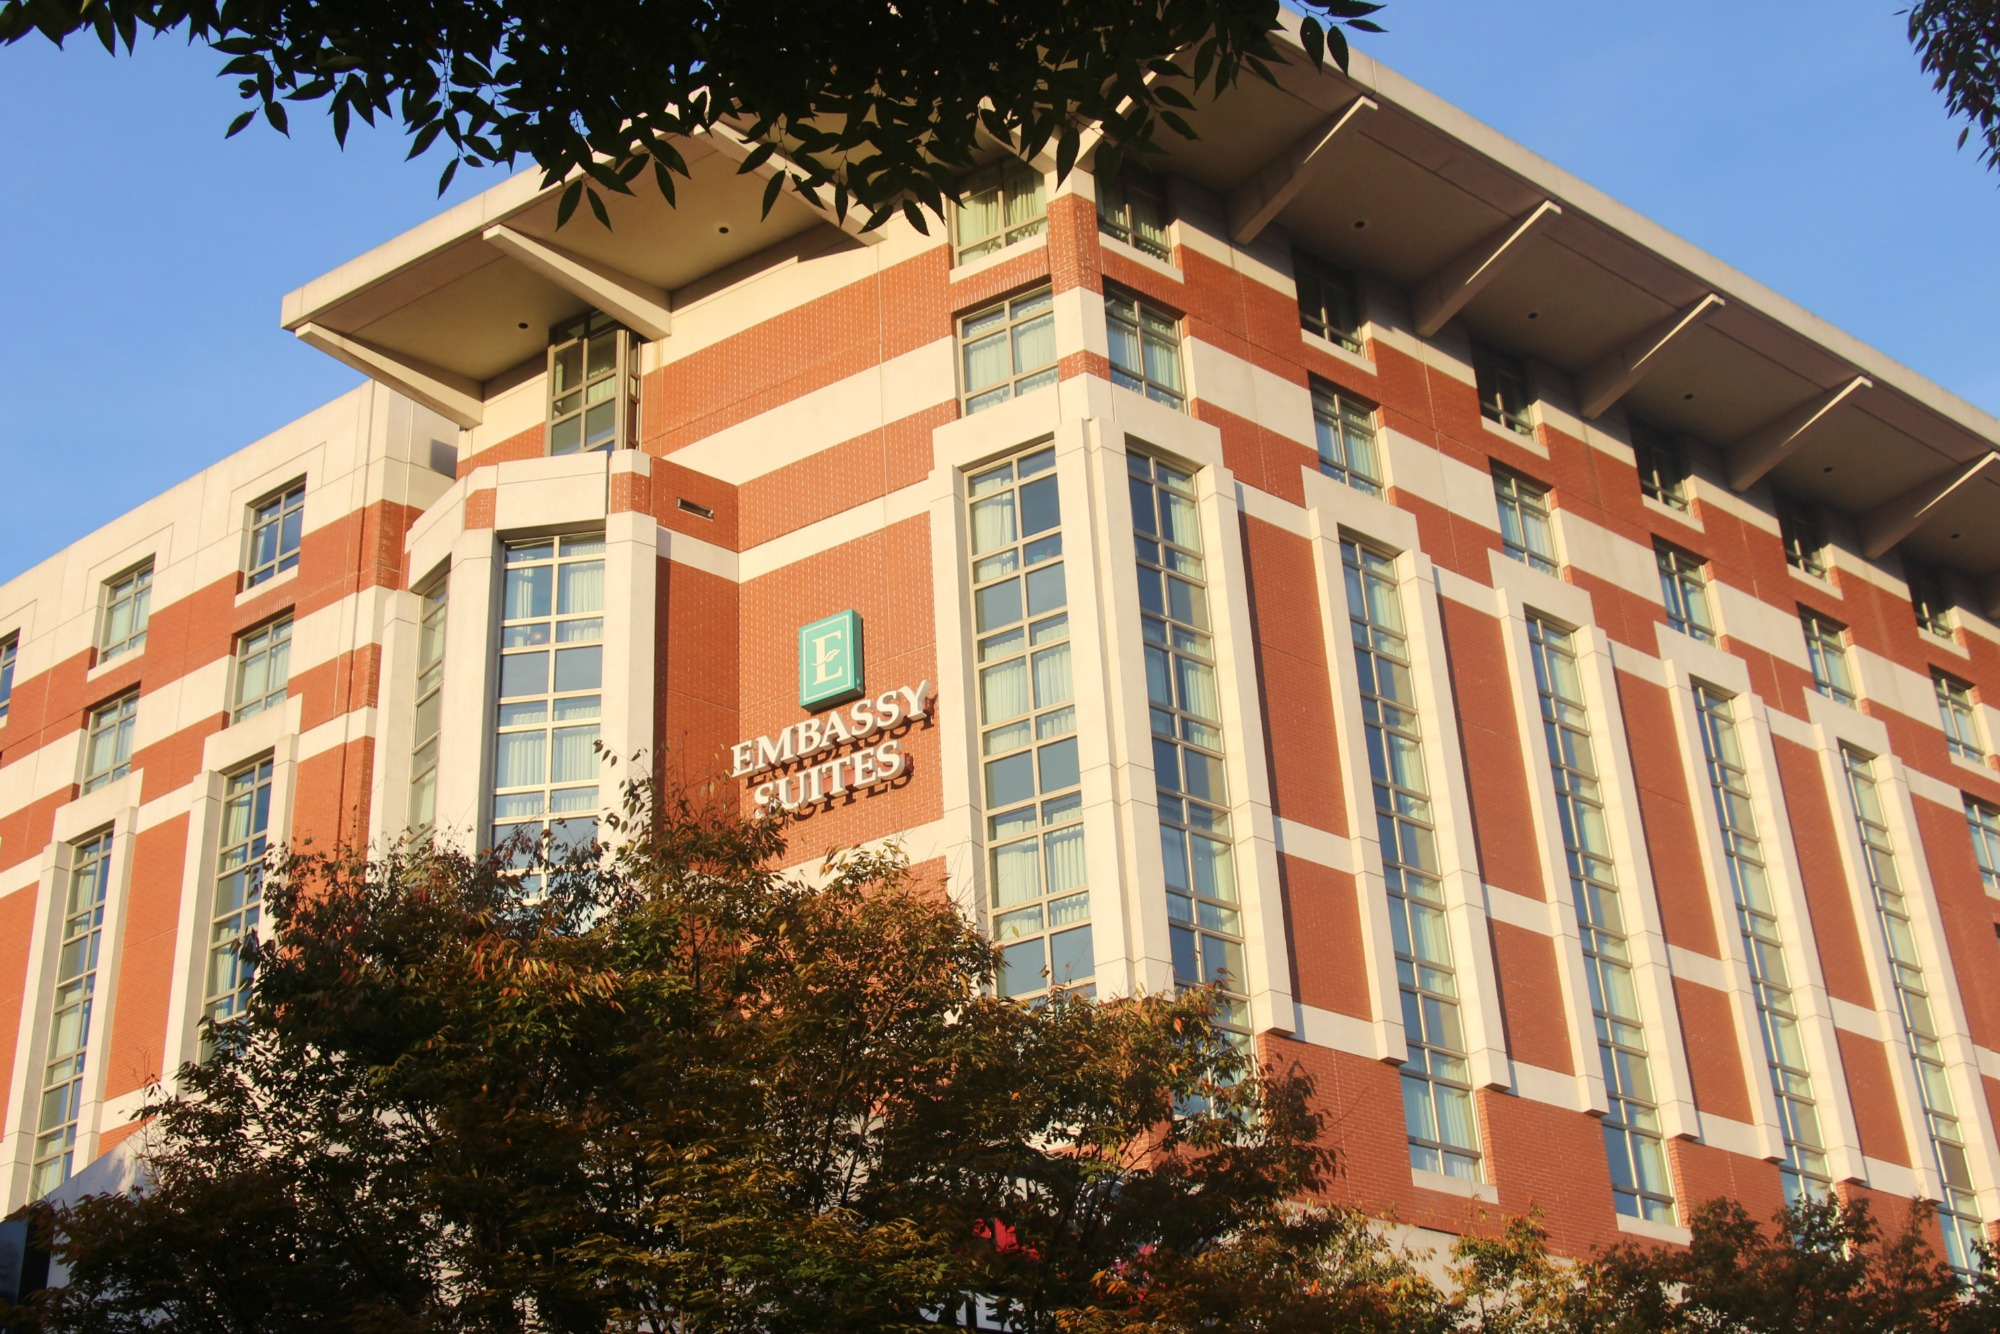 Embassy-Suites-Centennial-Olympic-Park-Atlanta.jpg